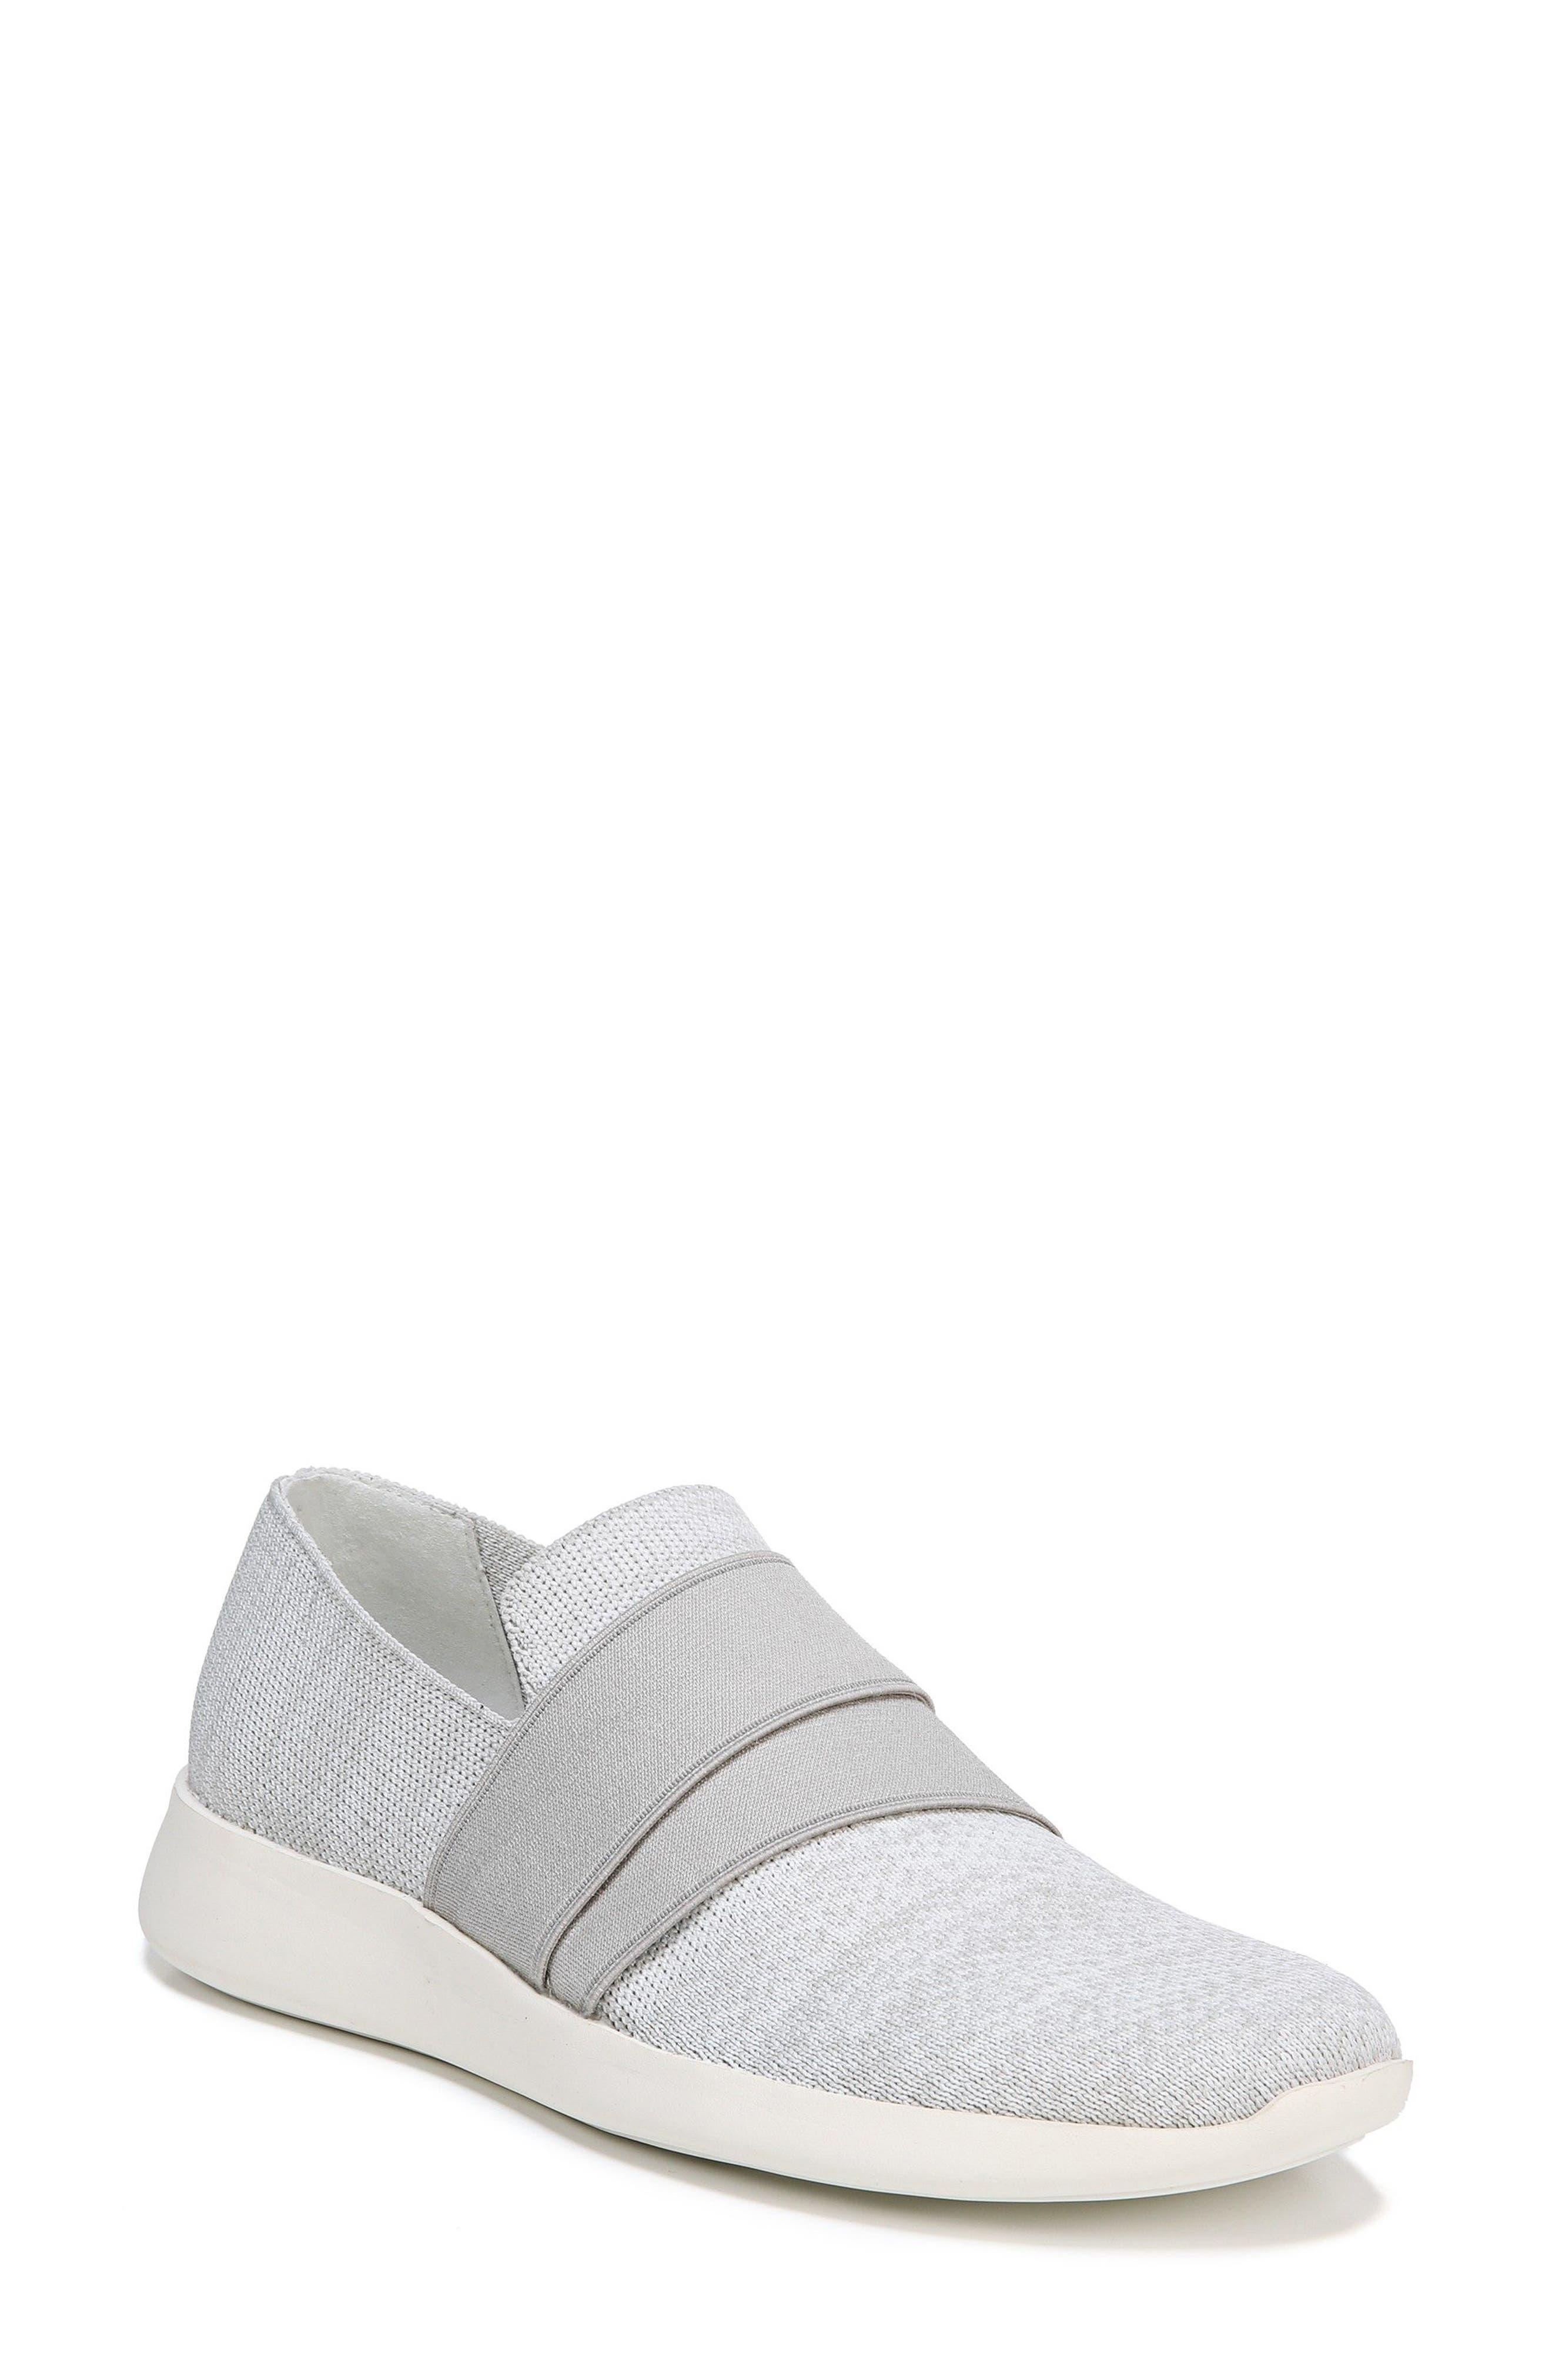 Aston Slip-On Sneaker,                             Main thumbnail 1, color,                             White/ Grey Marled Knit